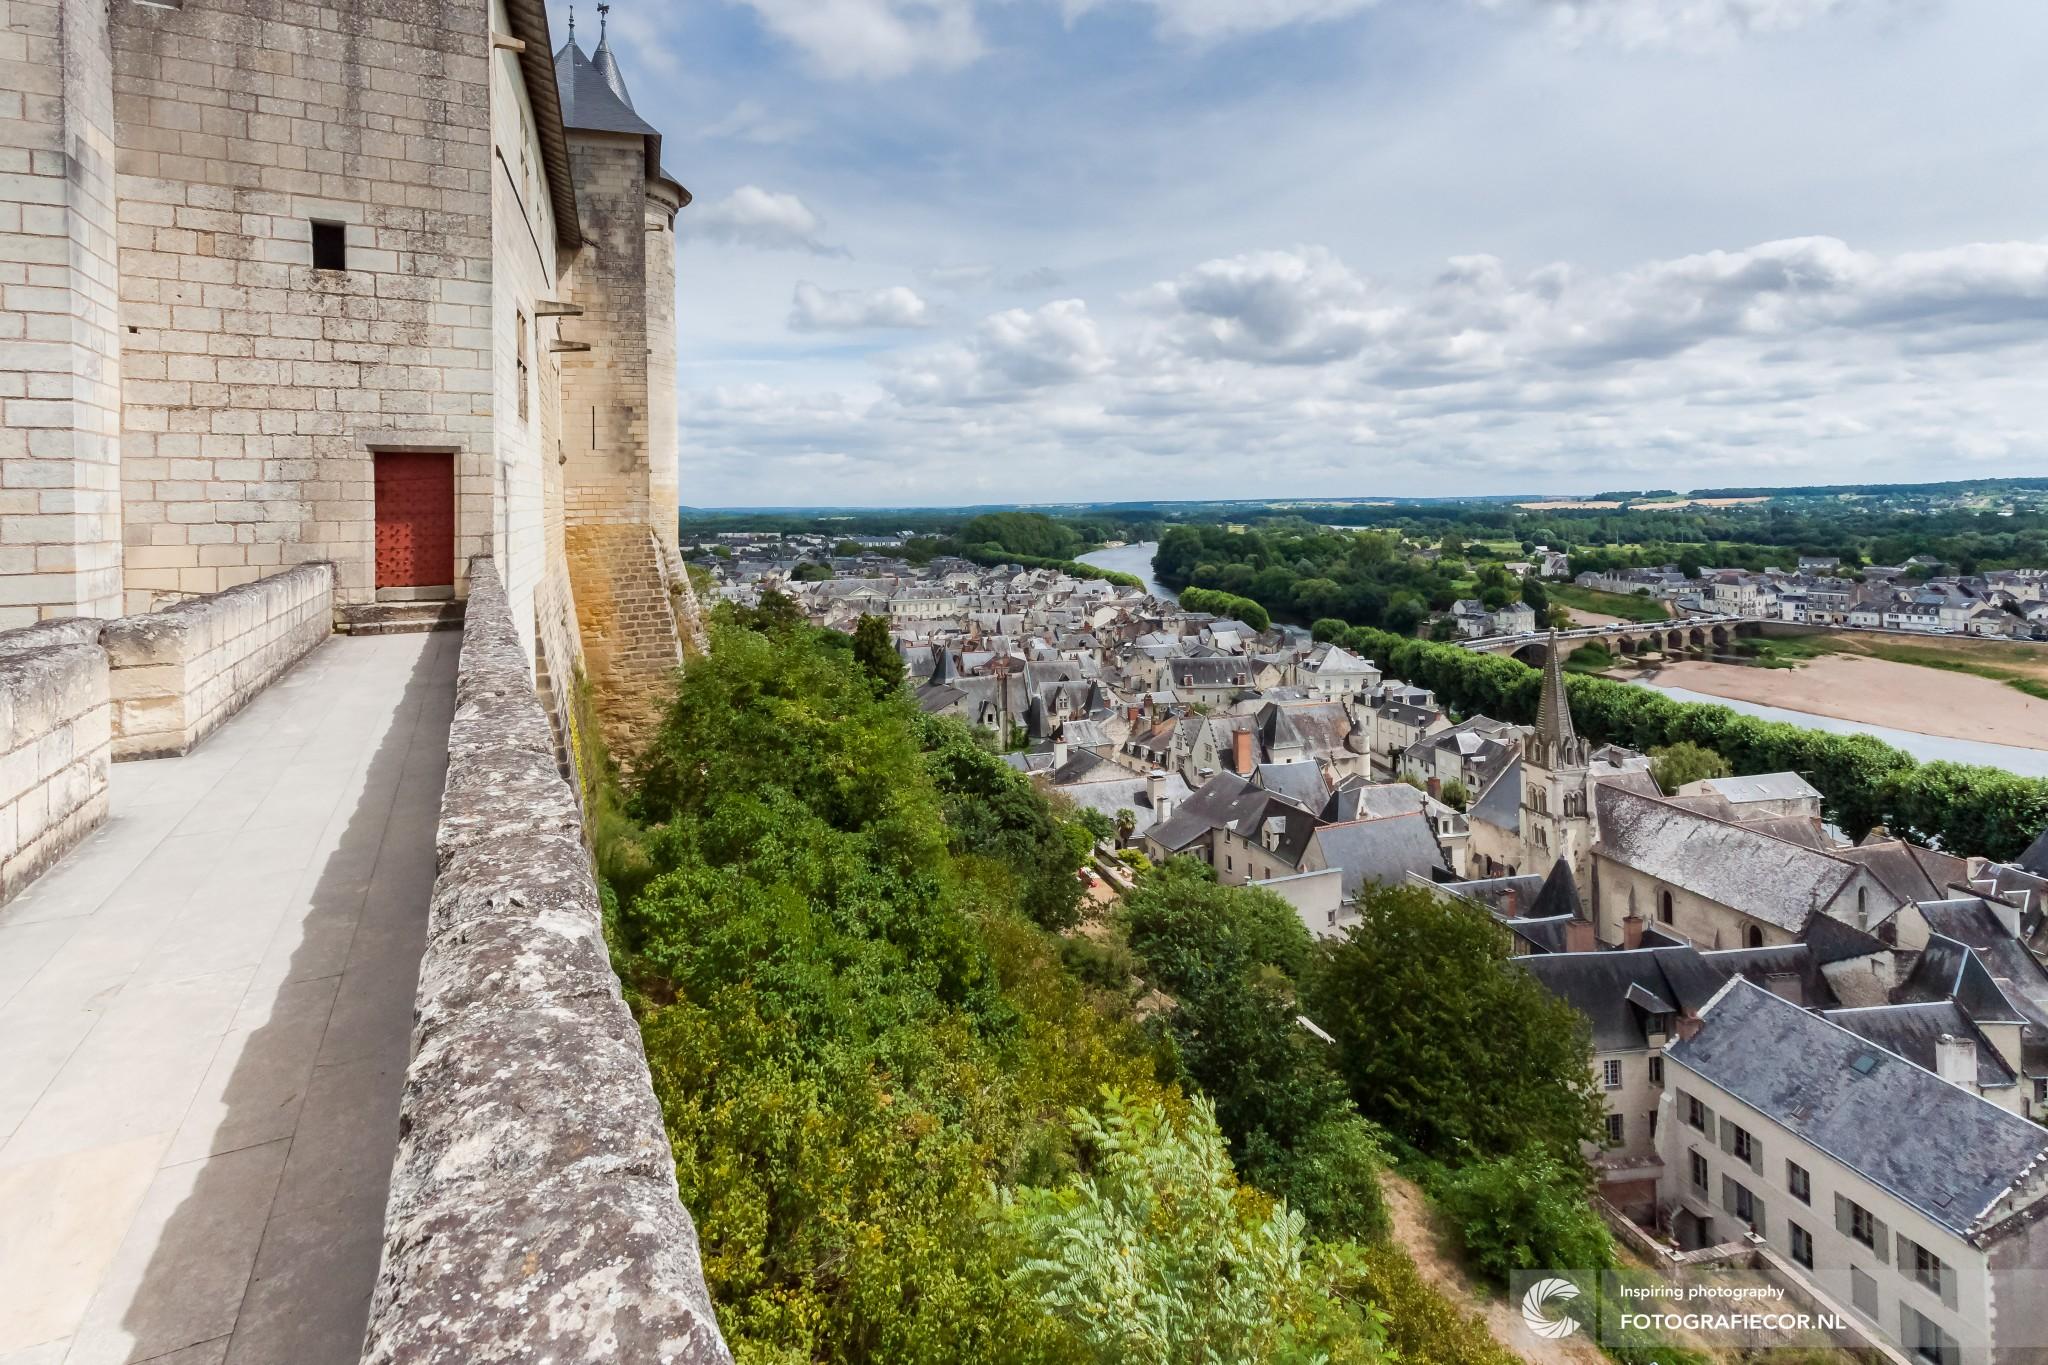 hyperfocale afstand | Chinon | Indre-et-Loire | landschap | kasteel | Frankrijk | vesting | fort | Touraine | Jeanne d'Arc